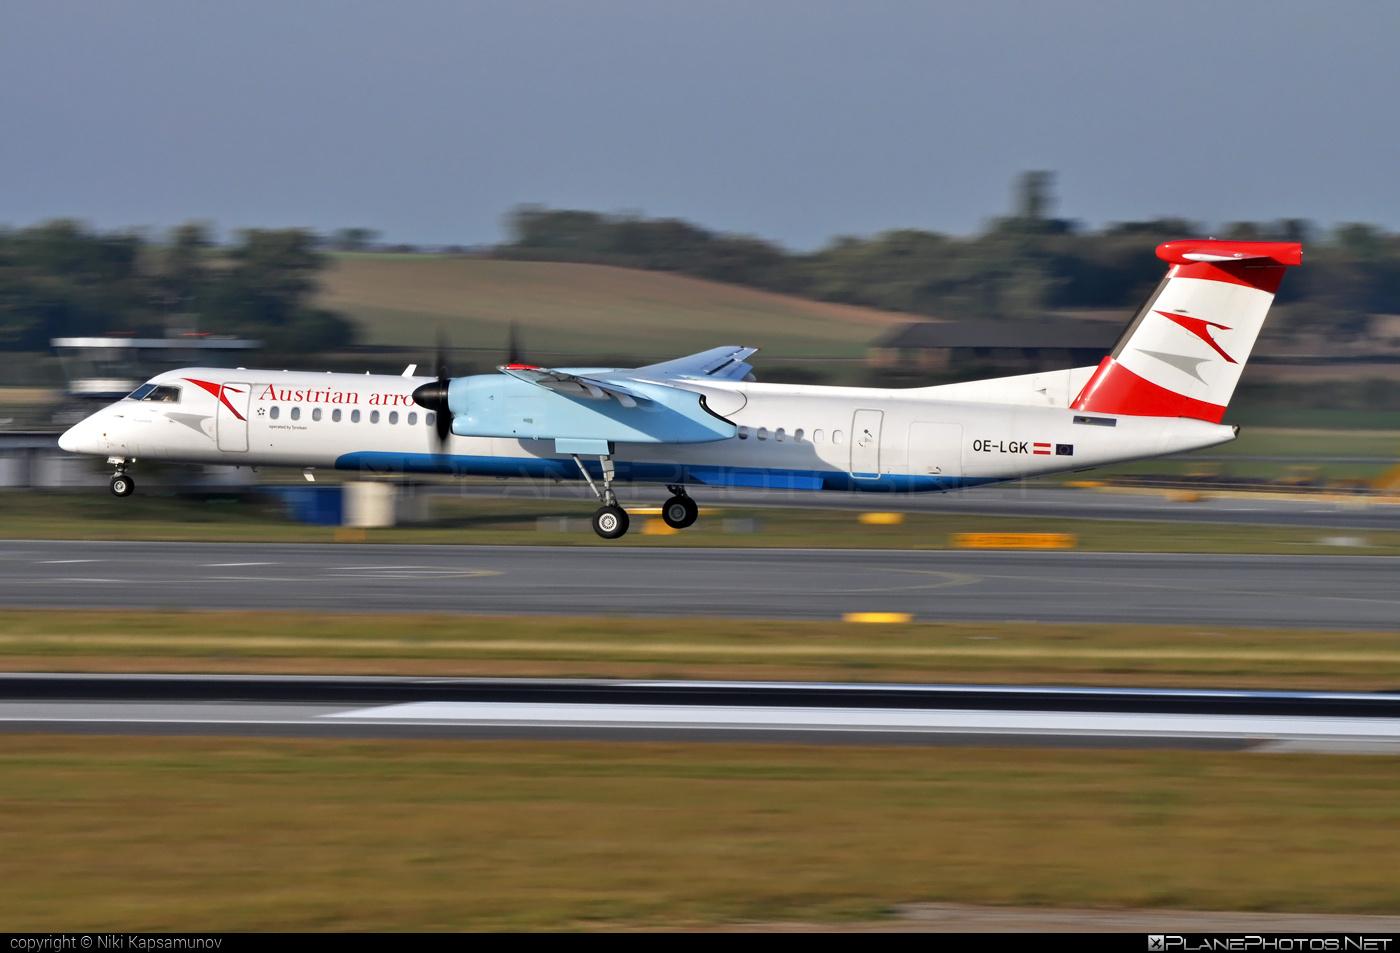 Bombardier DHC-8-Q402 Dash 8 - OE-LGK operated by Austrian arrows (Tyrolean Airways) #bombardier #dash8 #dhc8 #dhc8q402